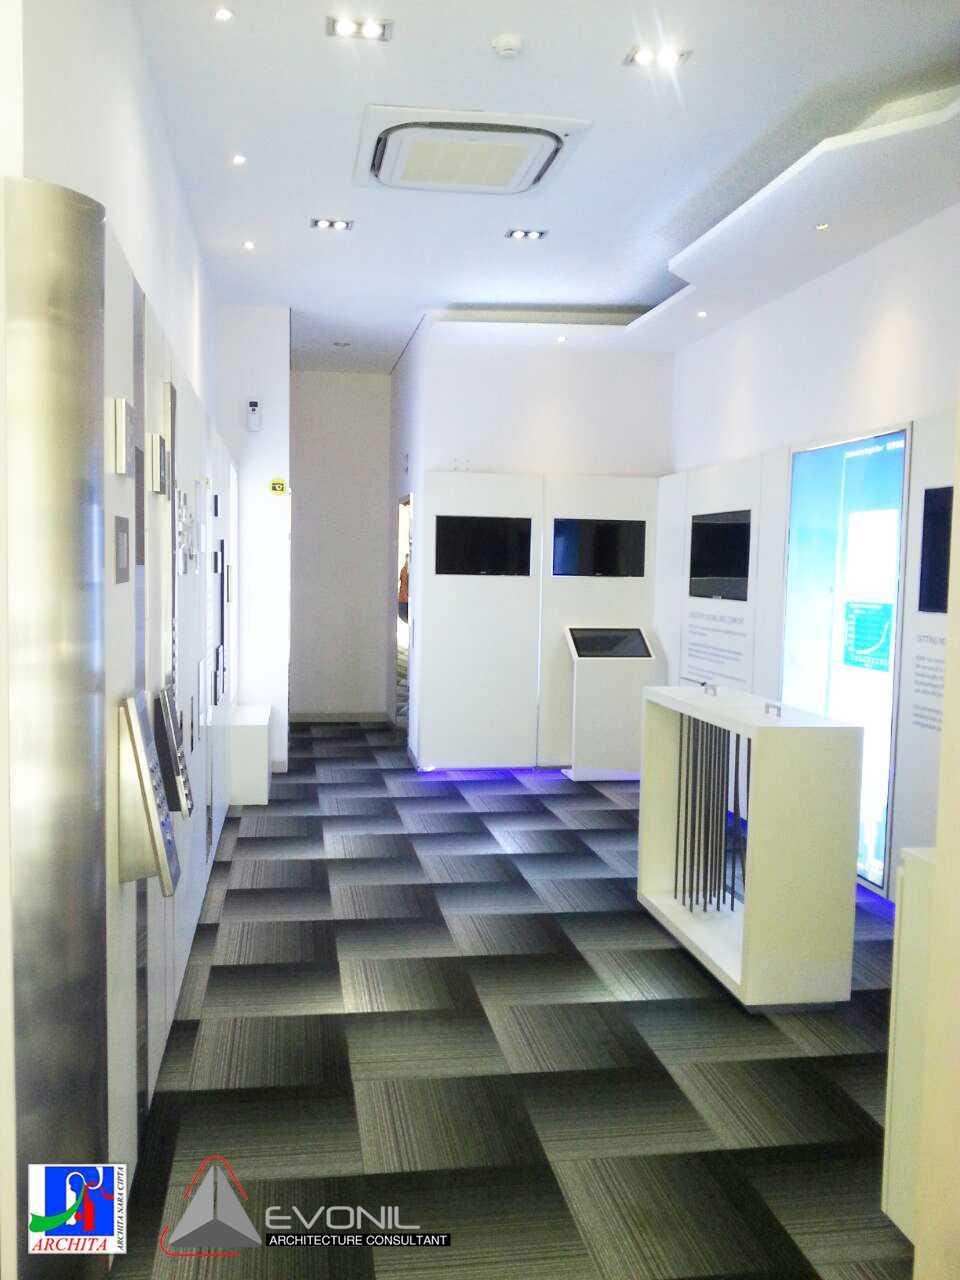 Foto inspirasi ide desain display area modern Kone-showroom-area-8 oleh EVONIL Architecture di Arsitag